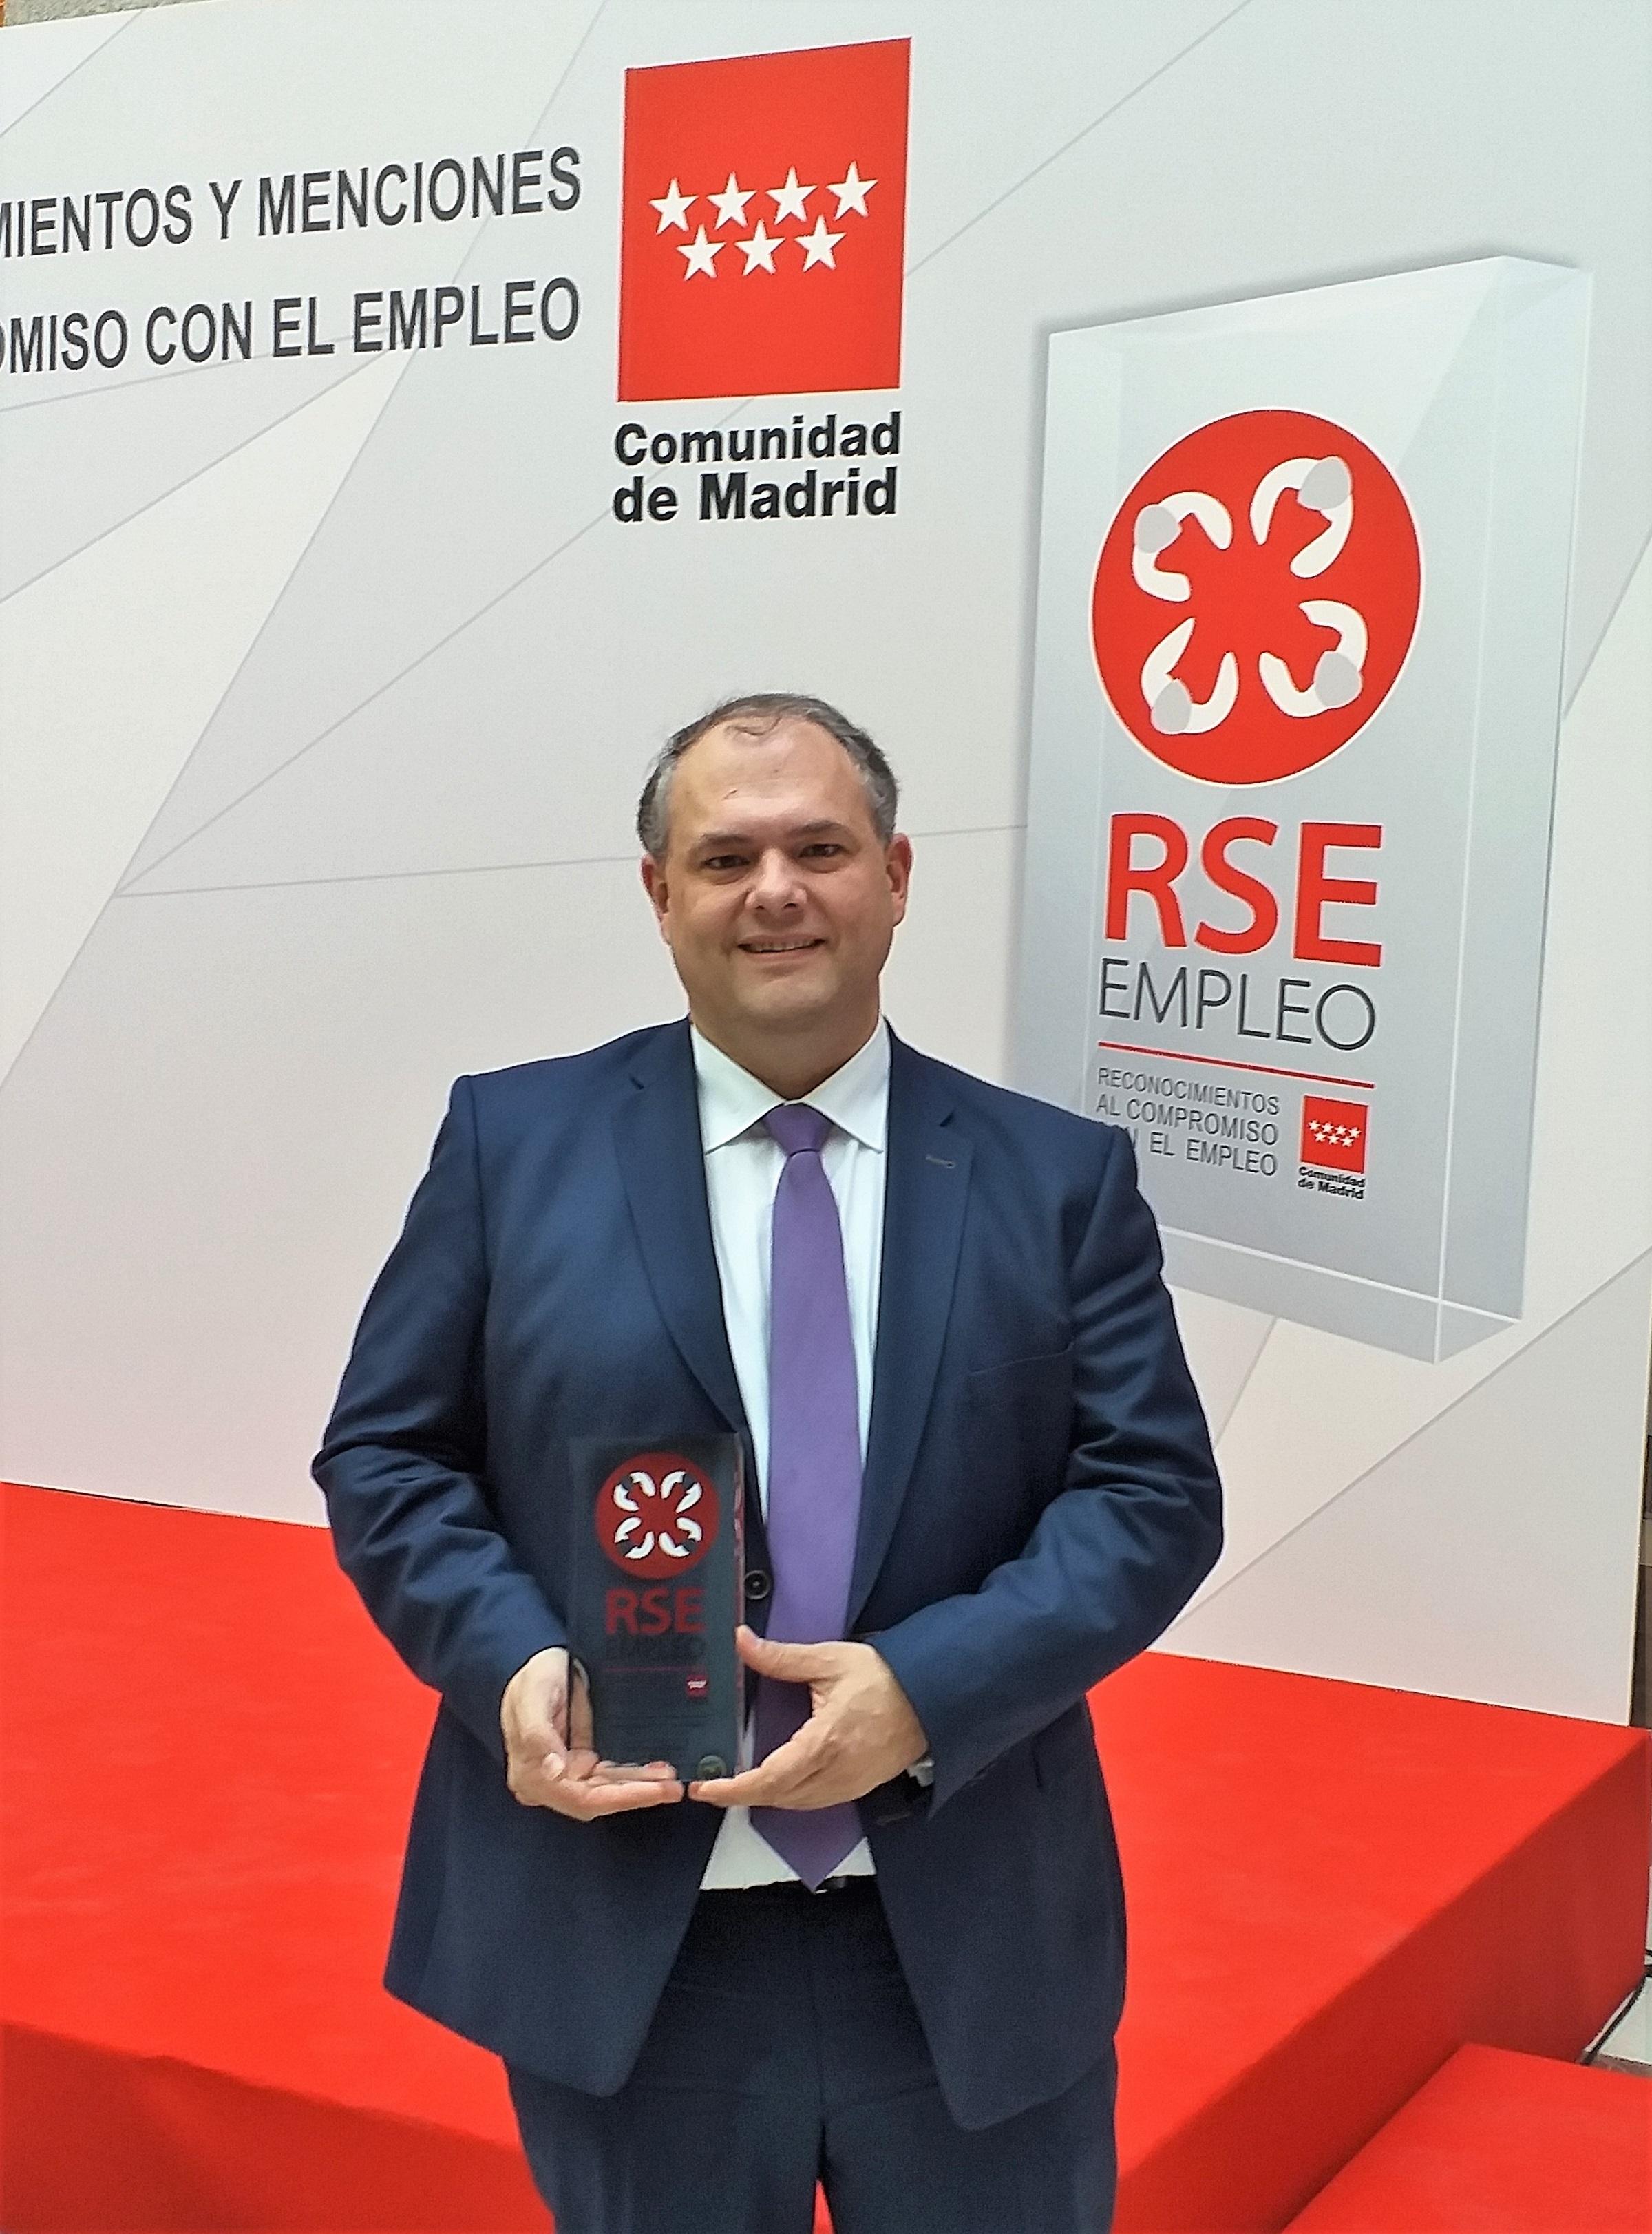 ESR Awards of the Community of Madrid